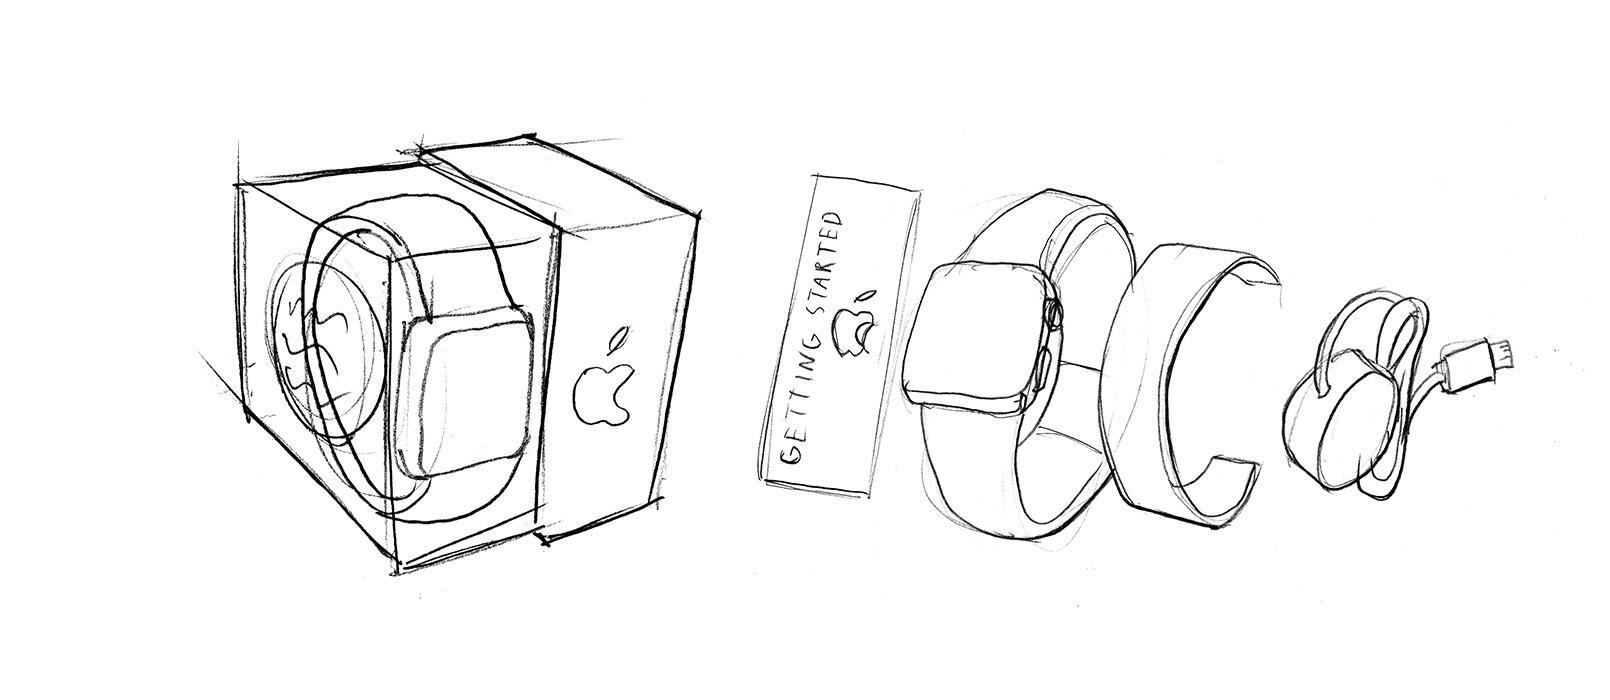 Apple-Watch-Smartwatch-Packaging-Design-IWatch-Indable-Technology-2.JPG